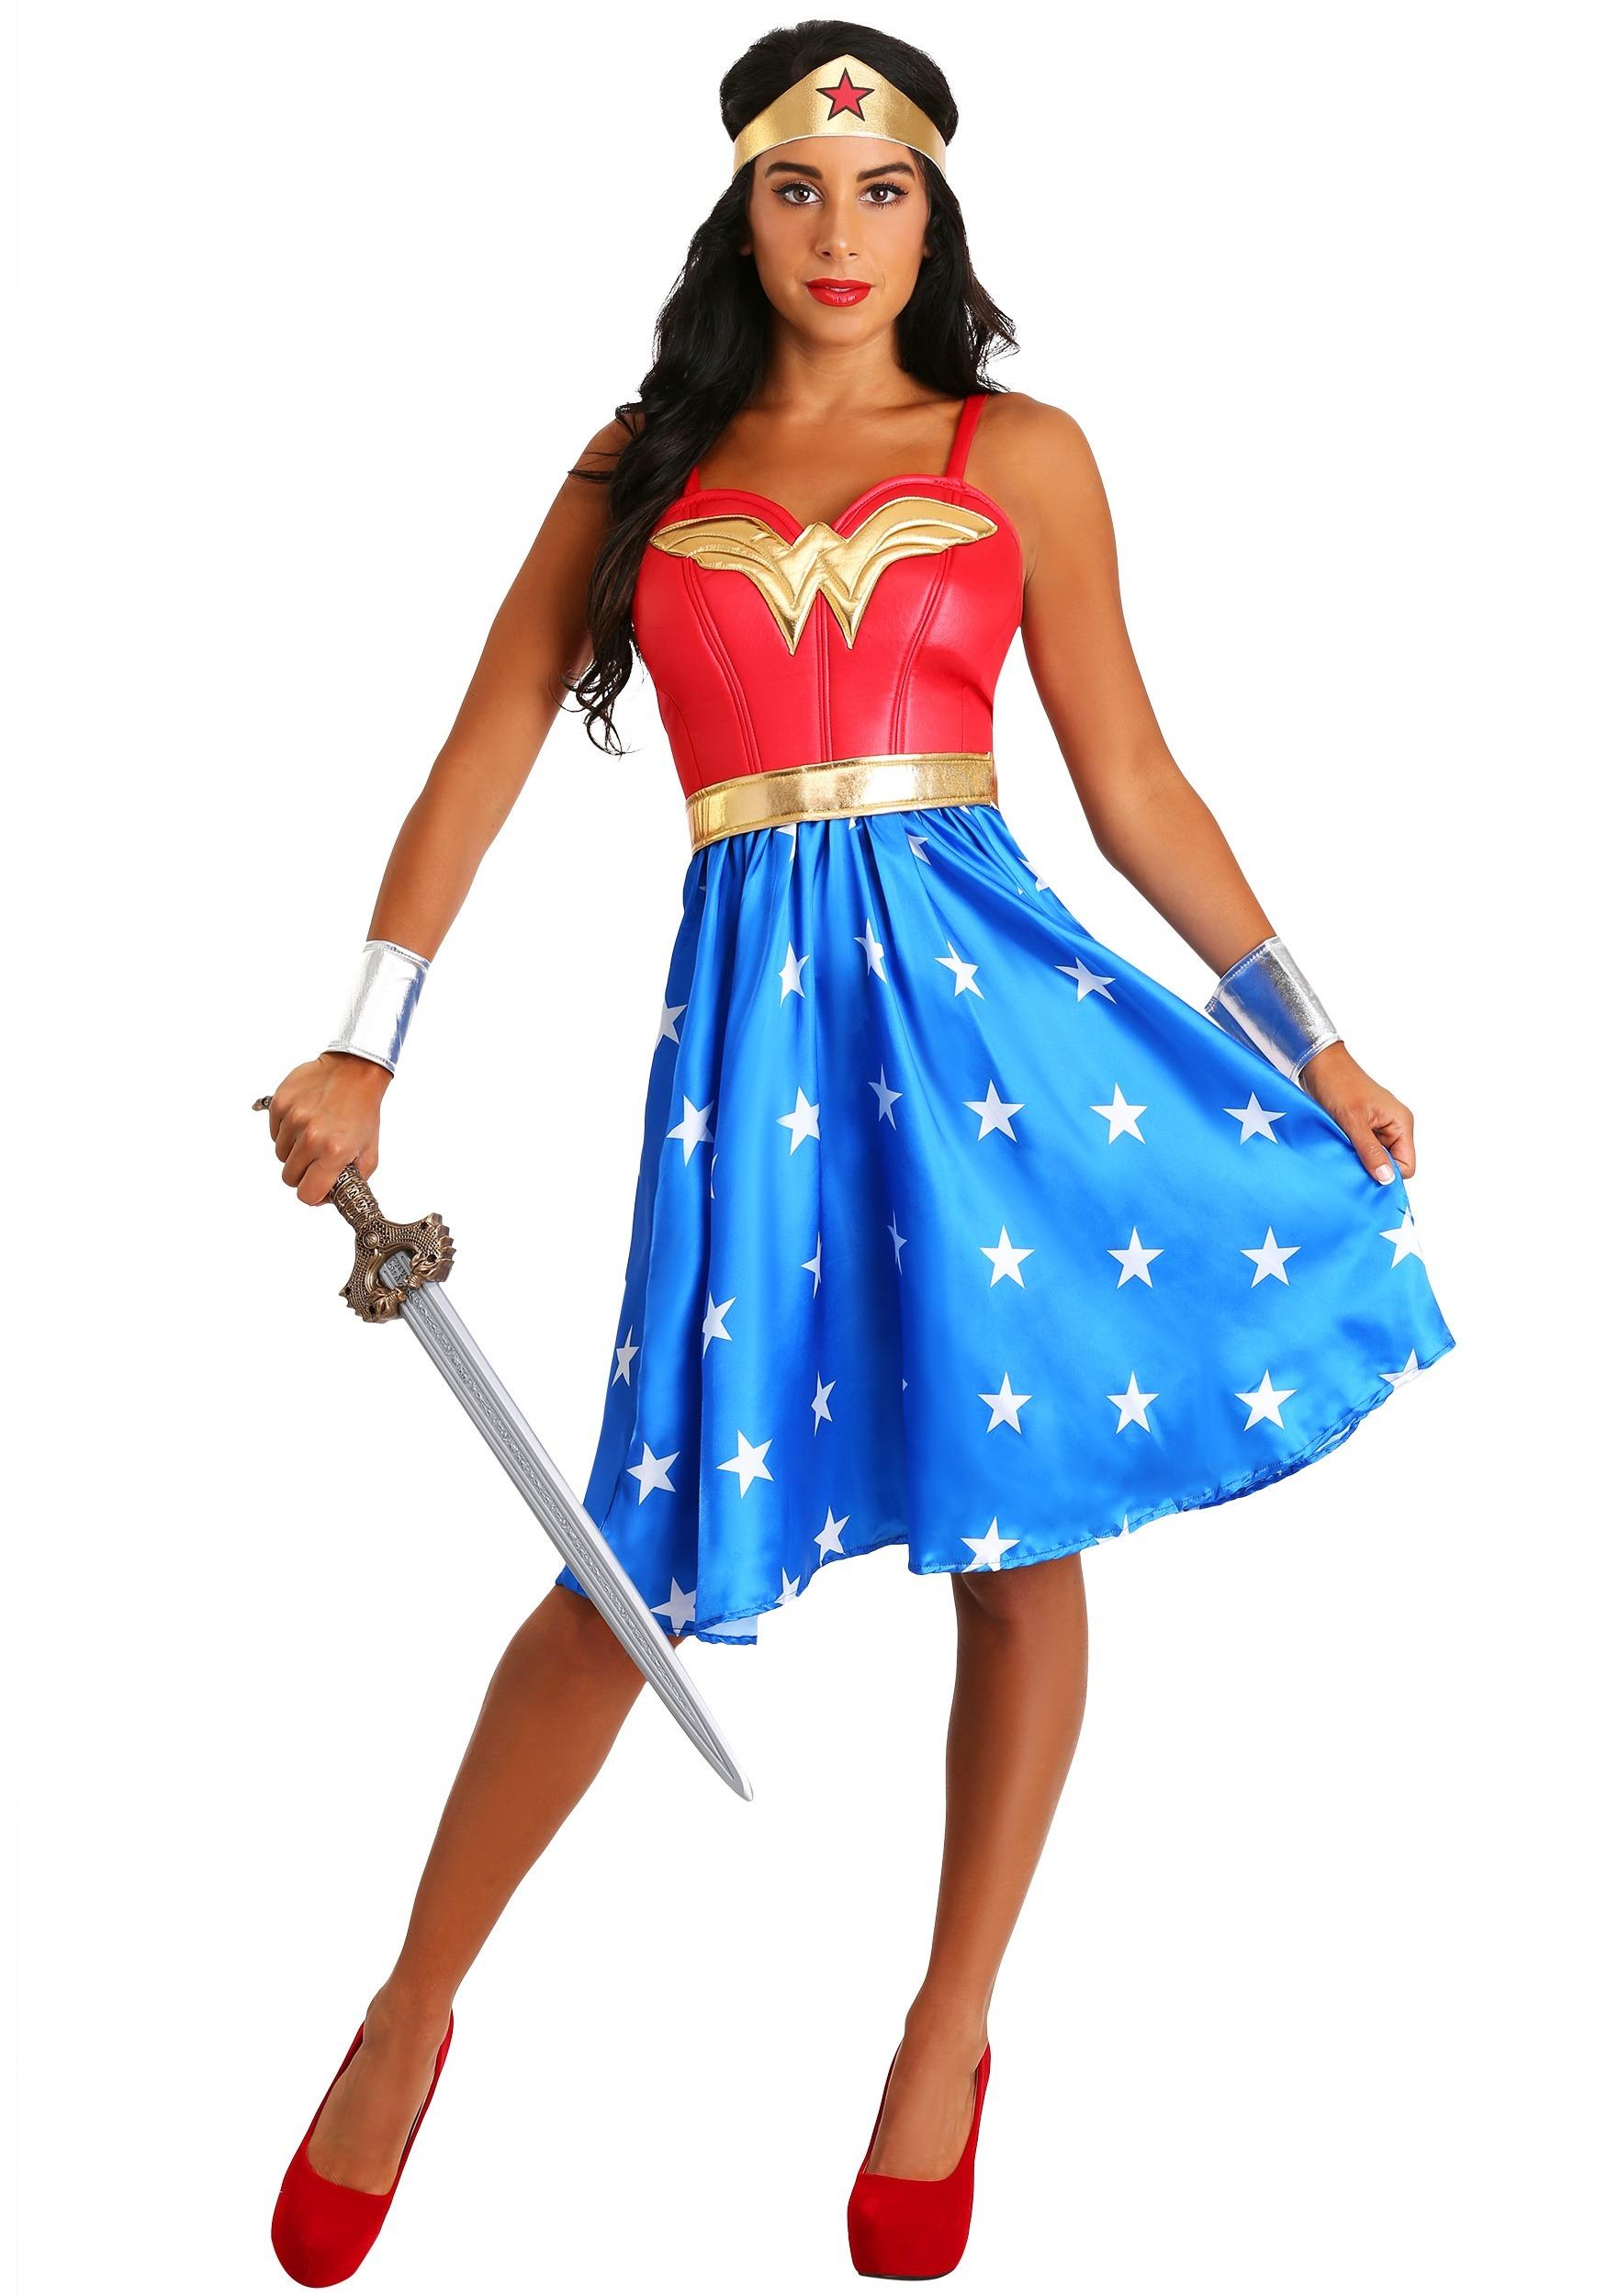 deluxe long dress wonder woman costume for women rh fun co uk Wonder Woman Costume for Women Wonder Woman Costume Emblem